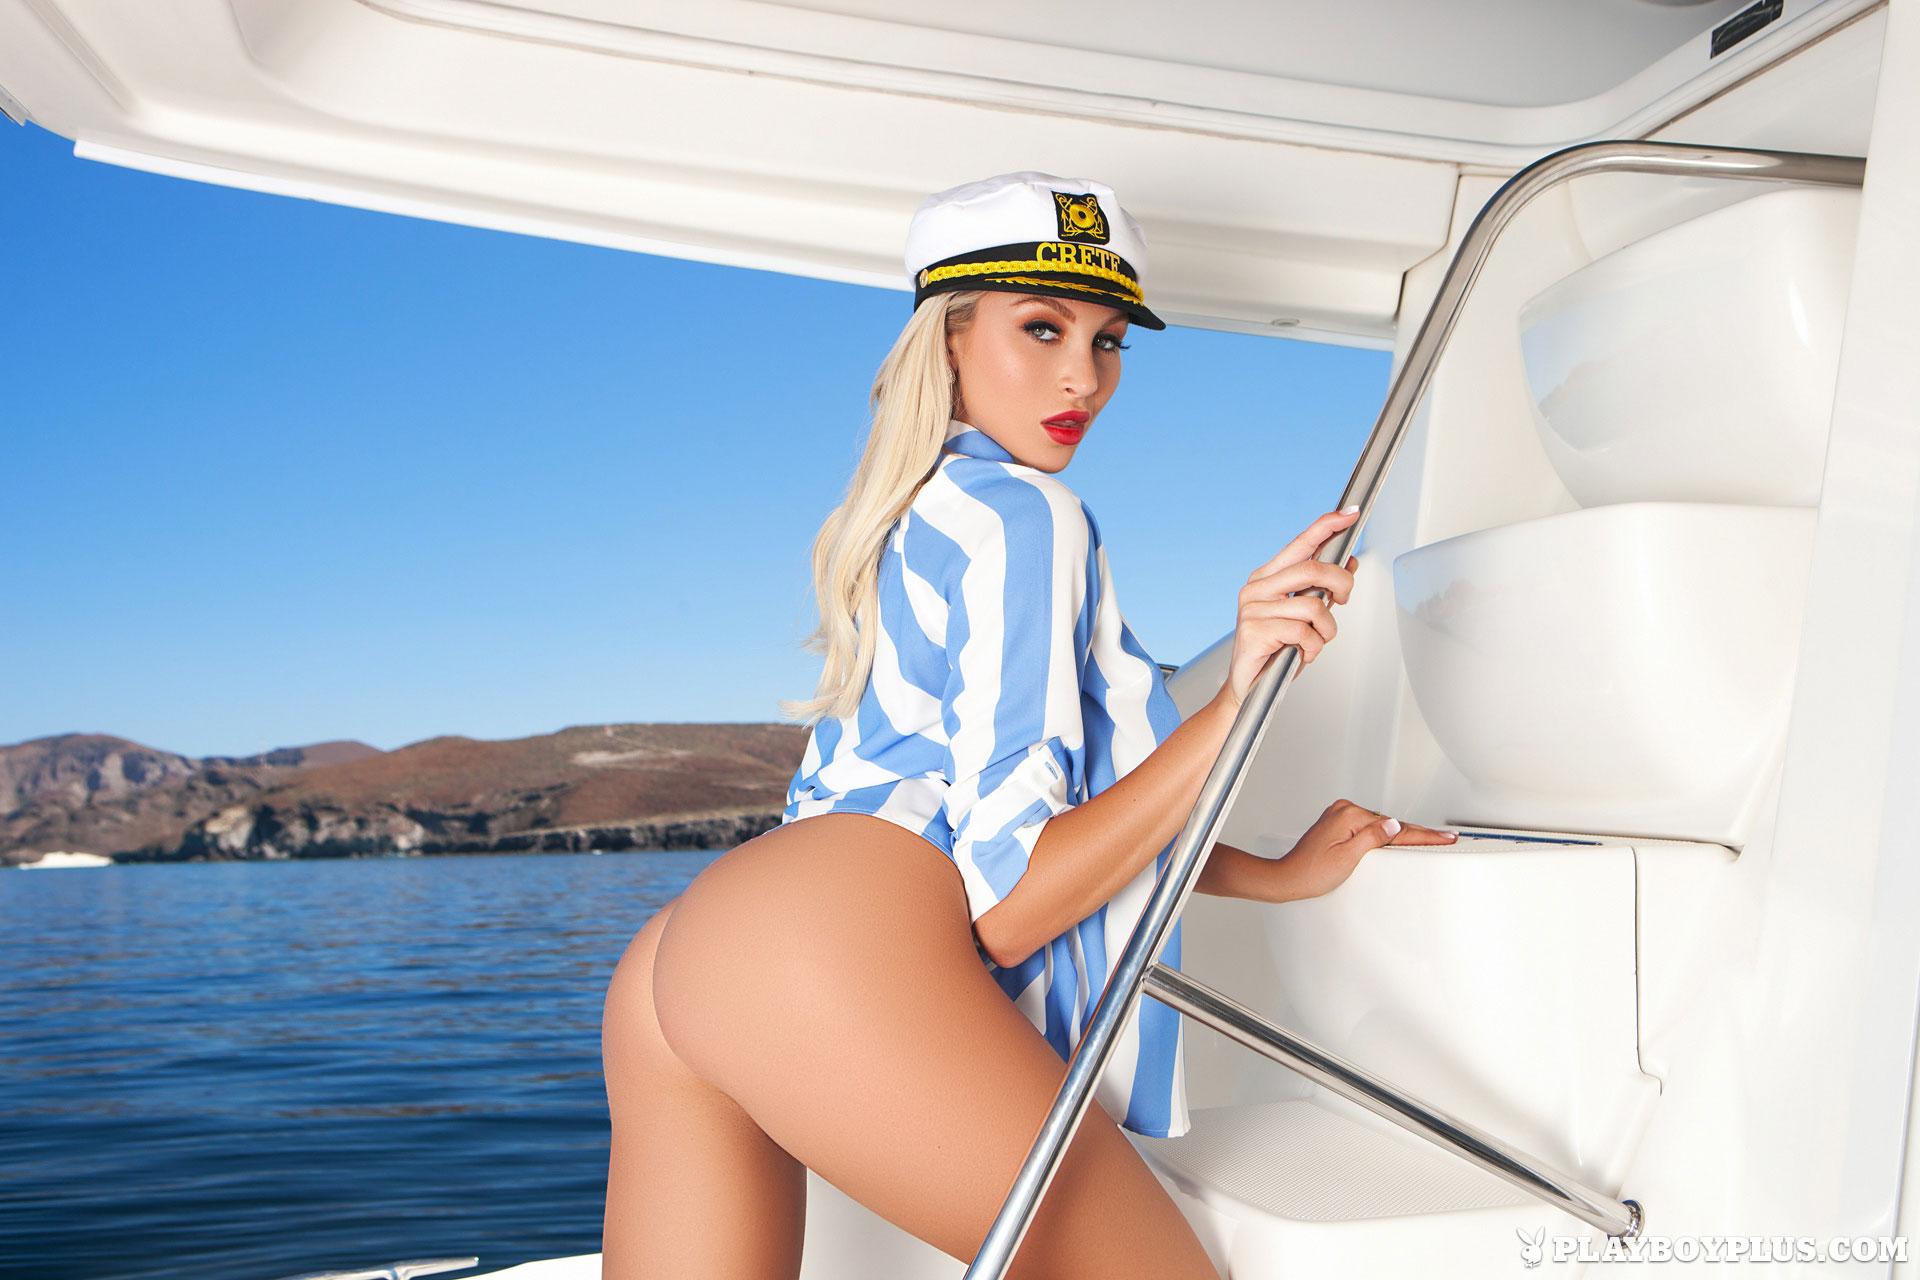 khloe-terae-captain-nude-boat-playboy-15